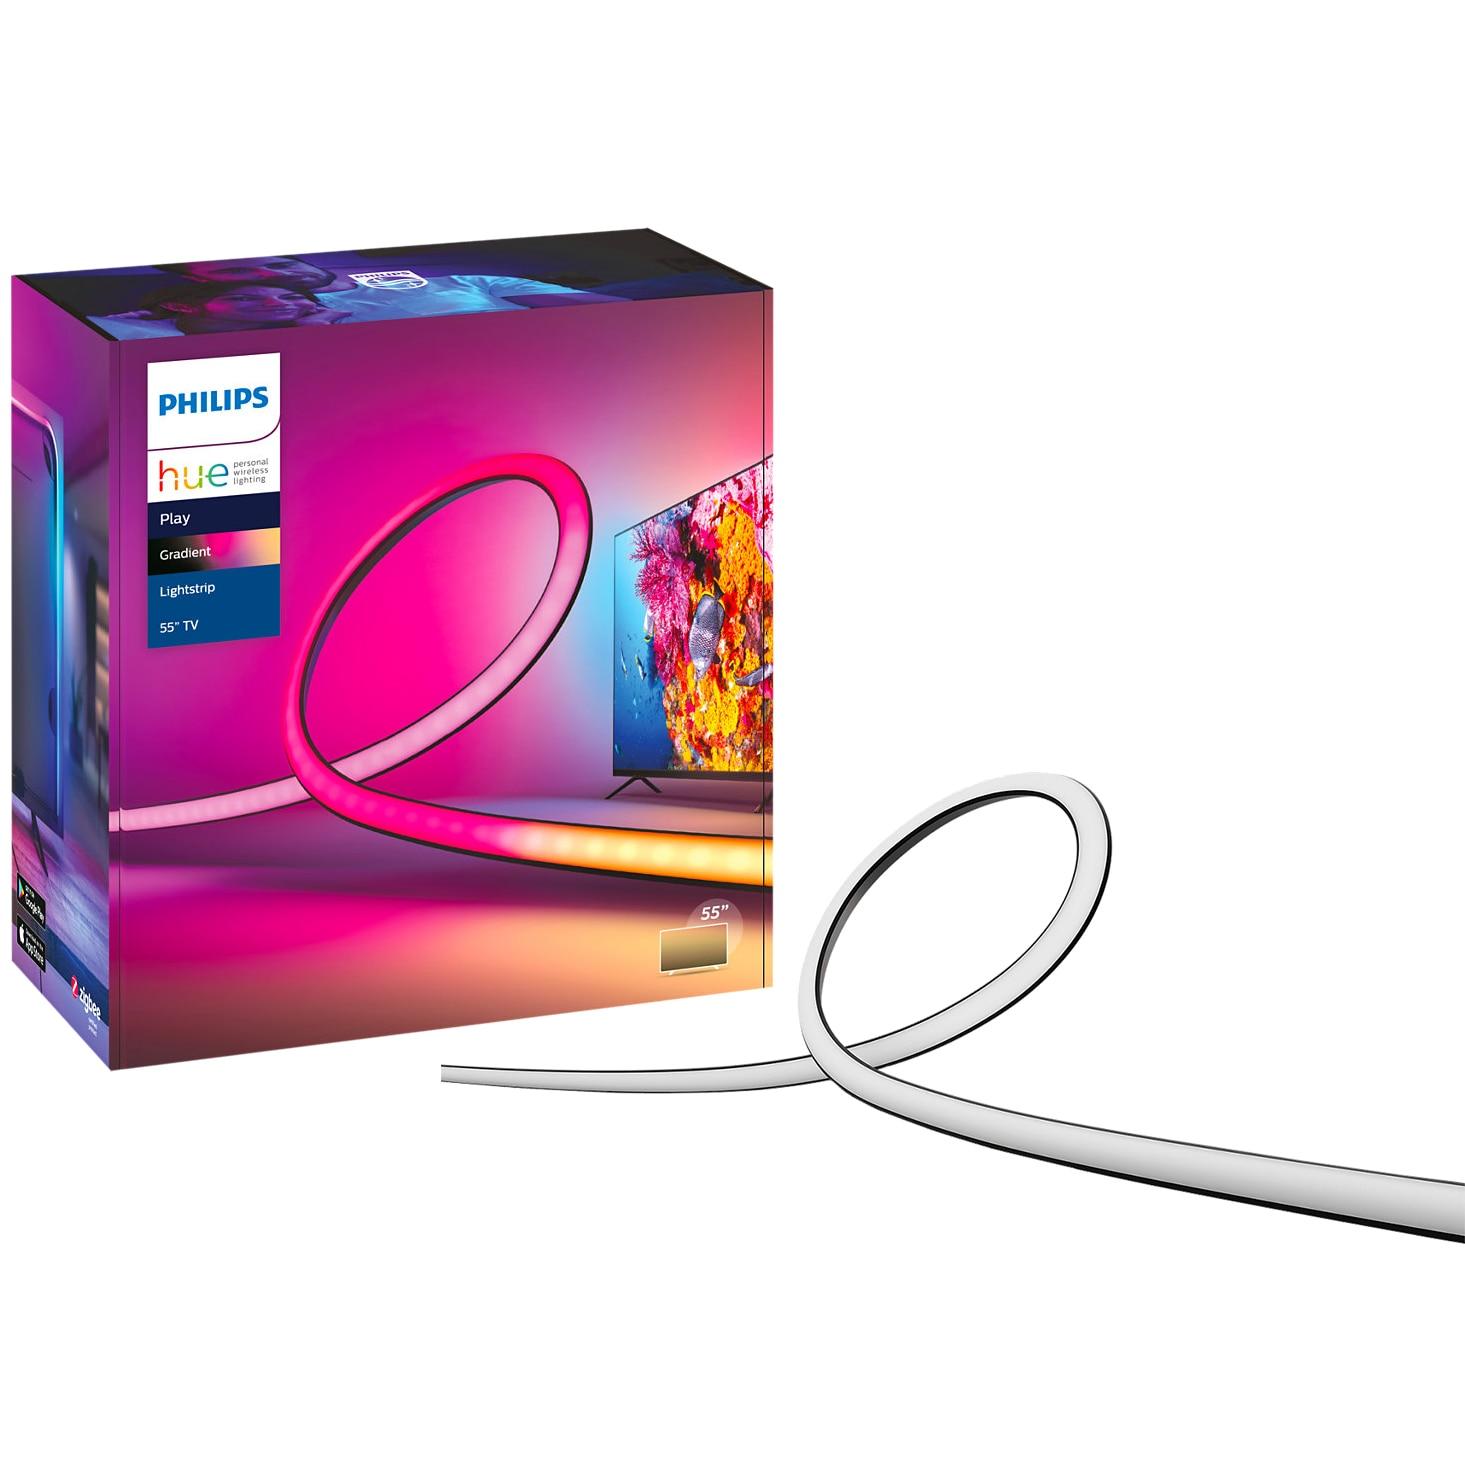 "Fotografie Banda LED RGBW inteligenta Philips Hue Play Gradient, pentru televizor 55"", 20W, 1100 lm, lumina alba si colorata, 216.5 cm, Silicon"